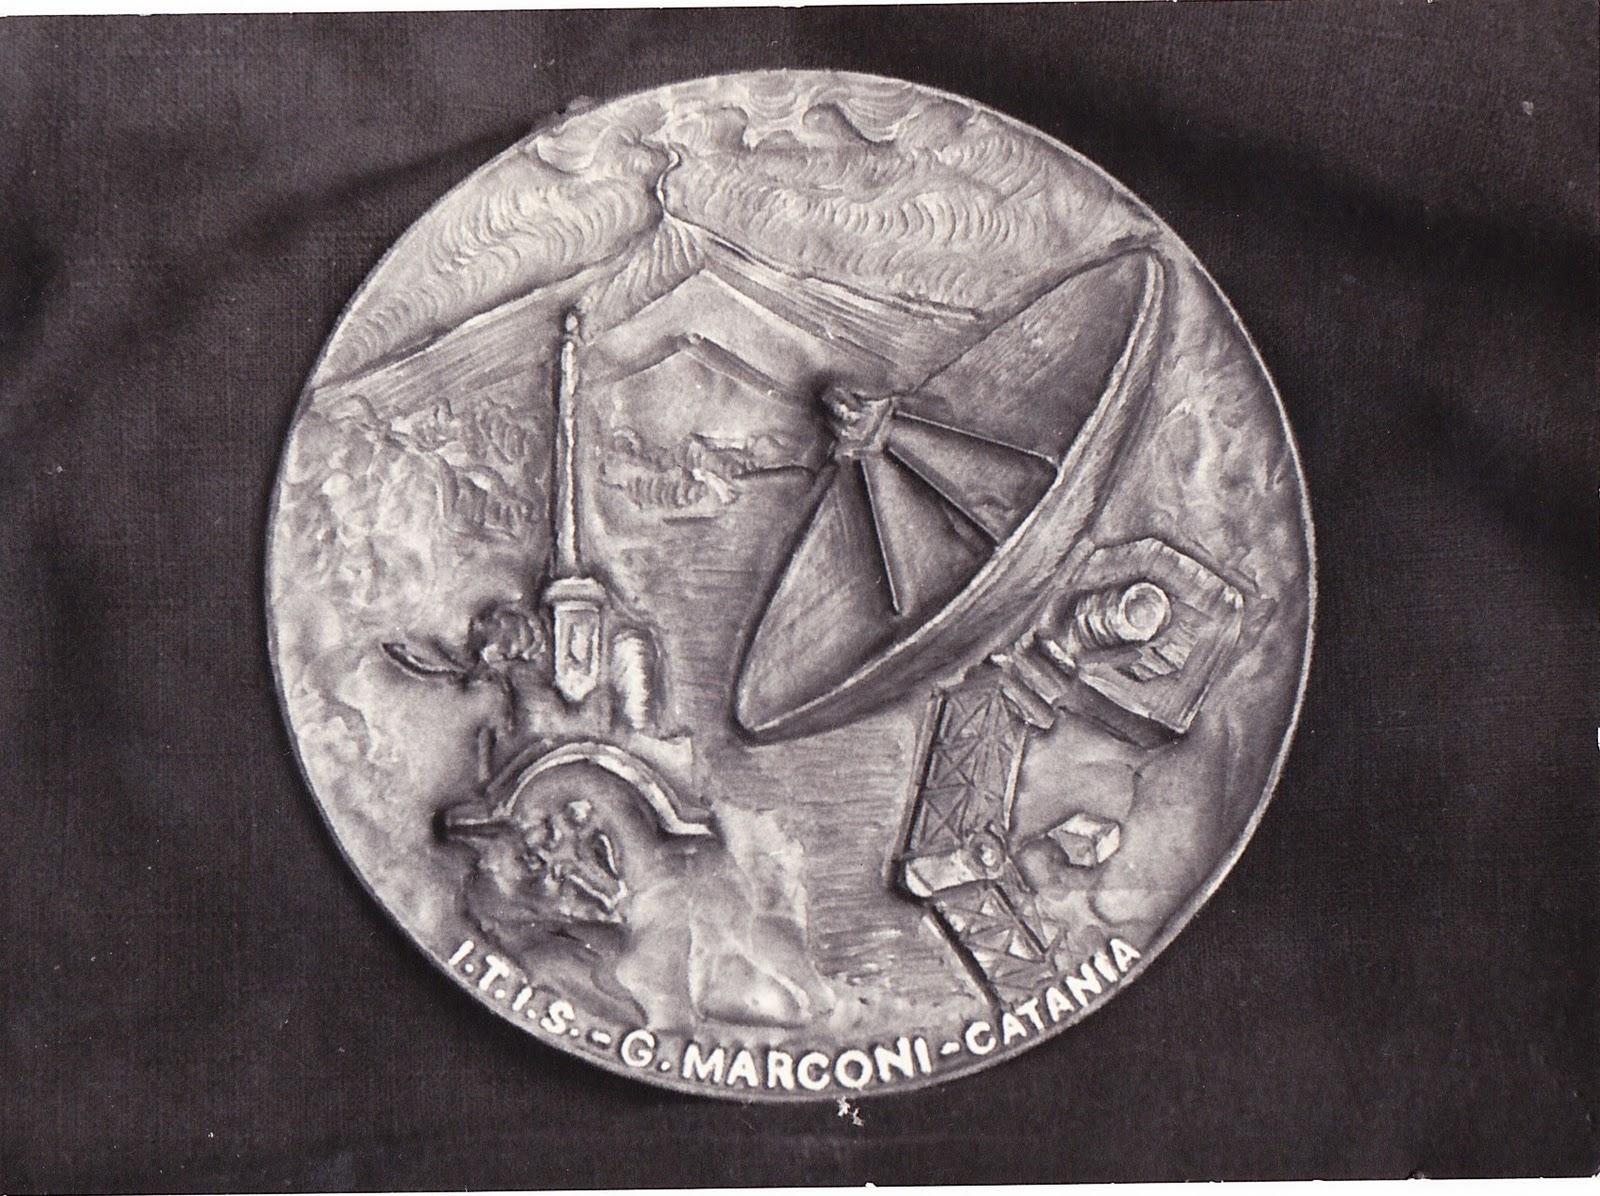 Guglielmo Marconi Stamps Catania 4 12 1988 Itis